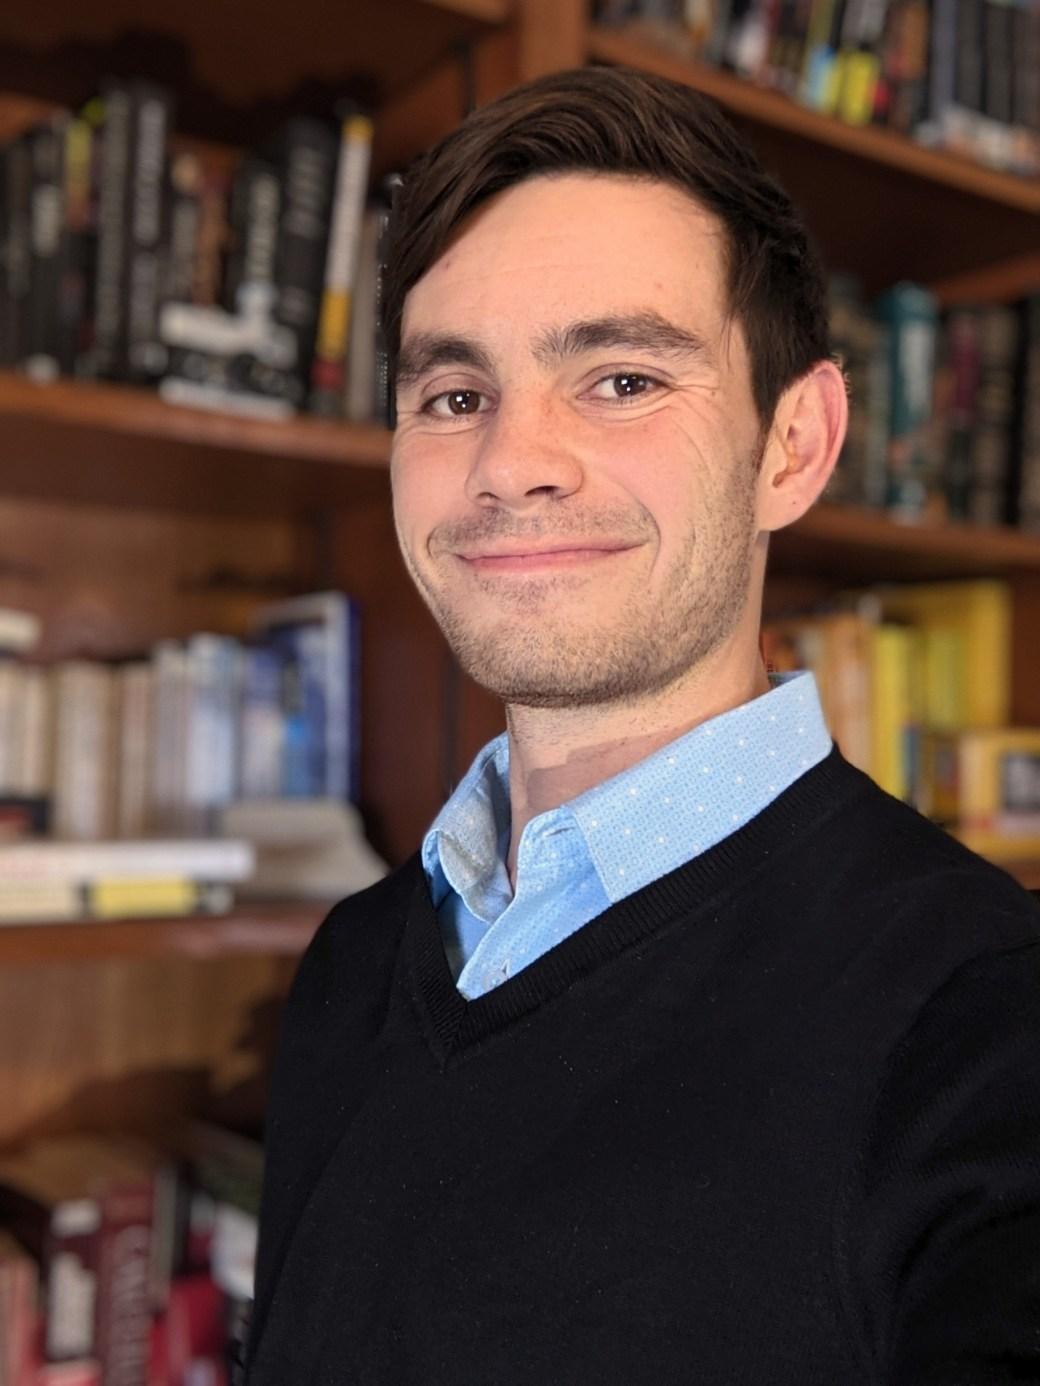 Curtis Segarra, Digital Investigative Data Reporter